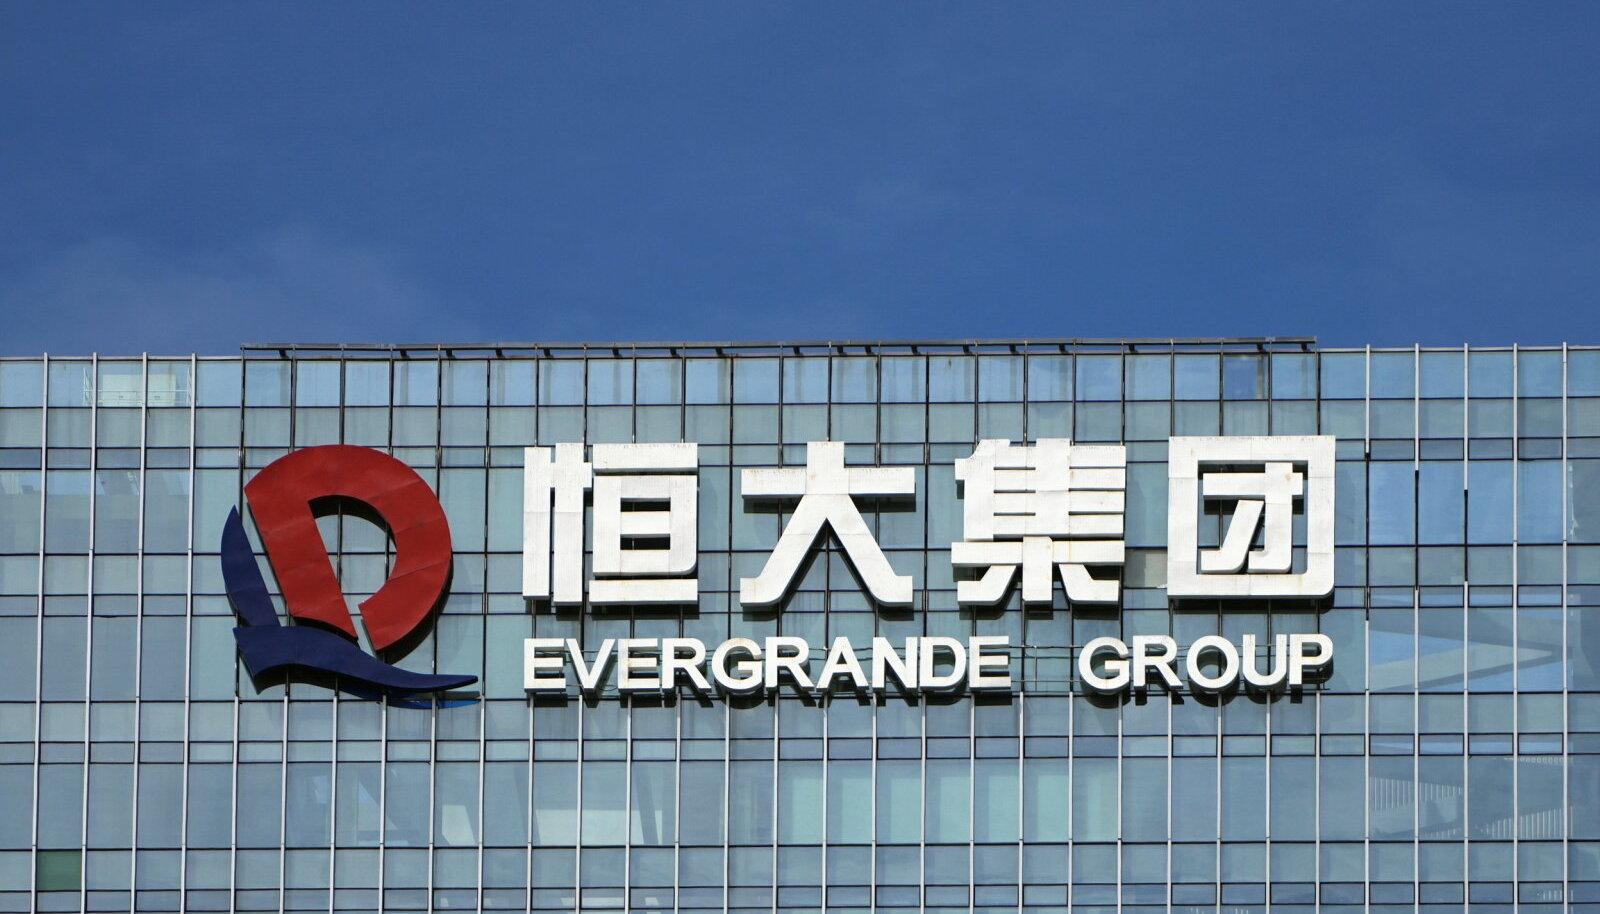 Hiina Evergrande kontserni peakontor Shenzhenis